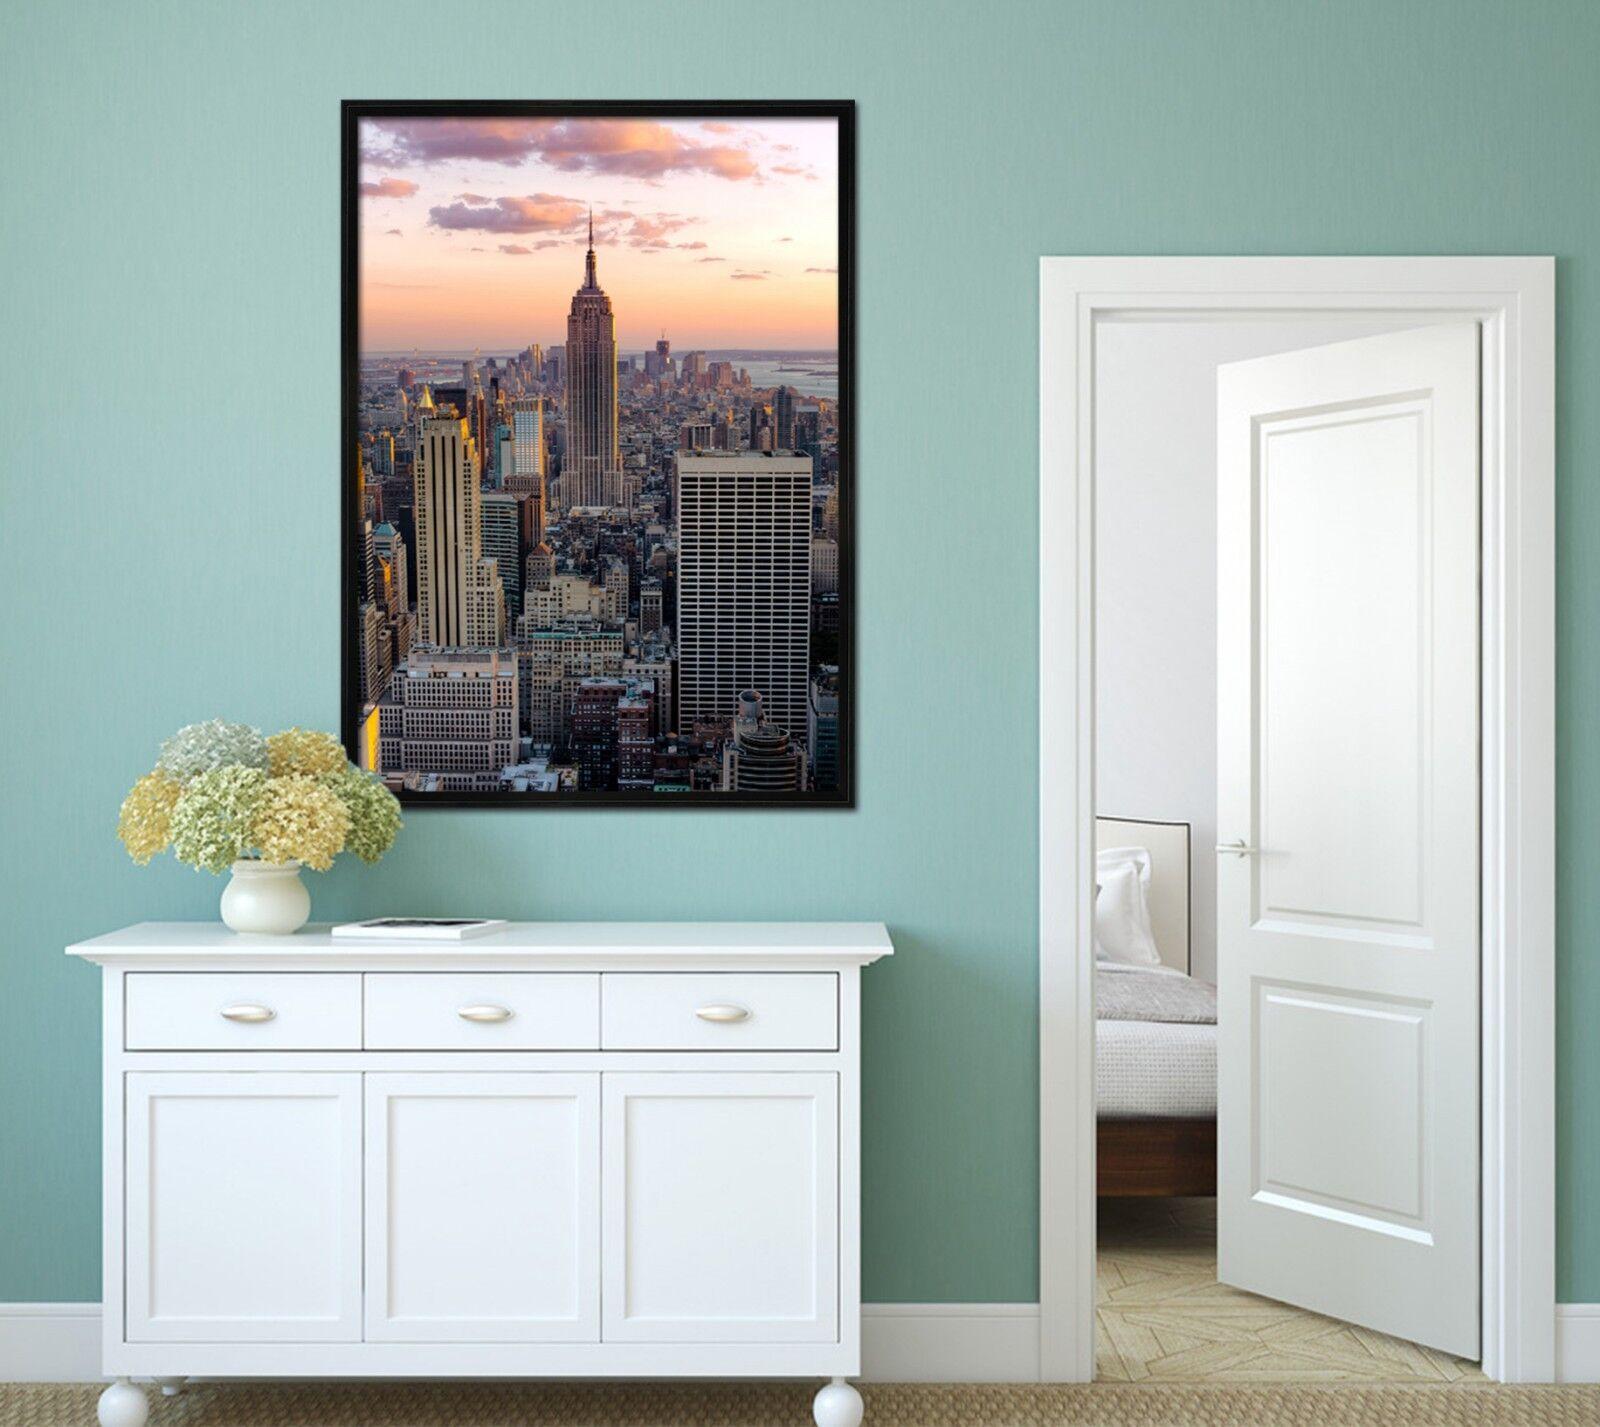 3D Skyscraper Building 2 Framed Poster Home Decor Print Painting Art WALLPAPER